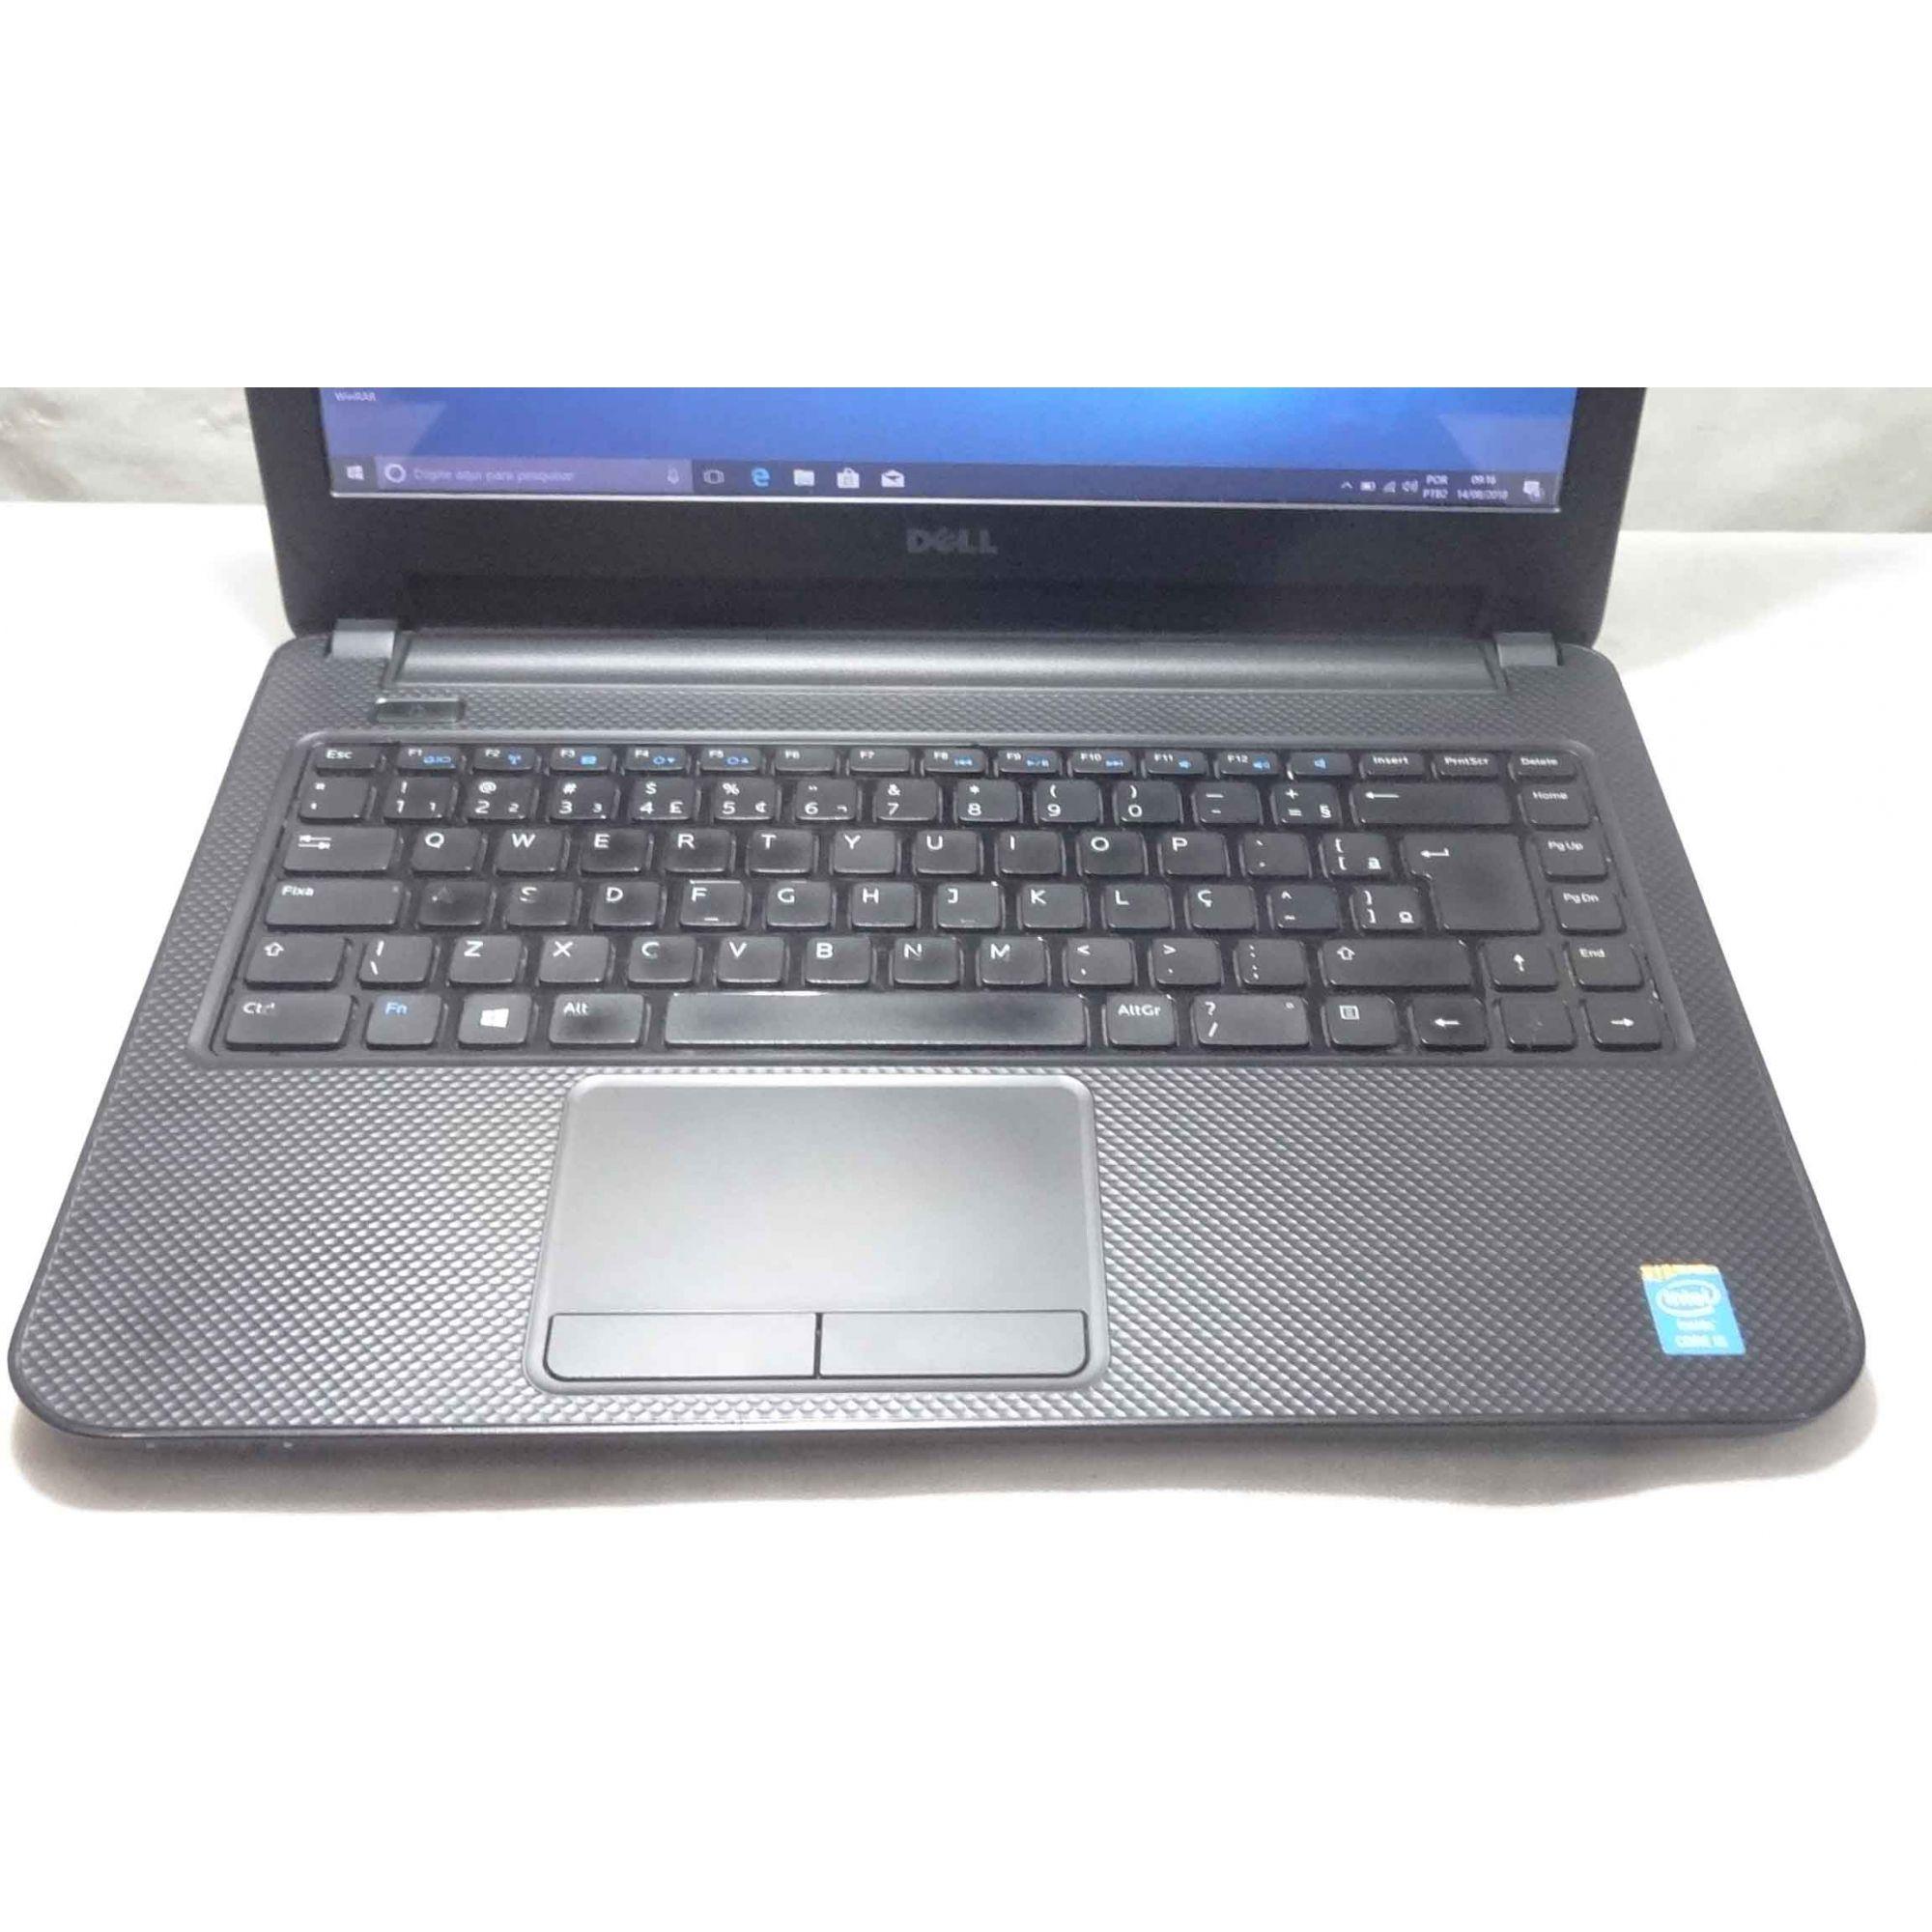 Notebook Dell Inspiron 3437 i5 1.6GHz 4GB HD-1TB 1GB Dedicada (Não Enviamos)